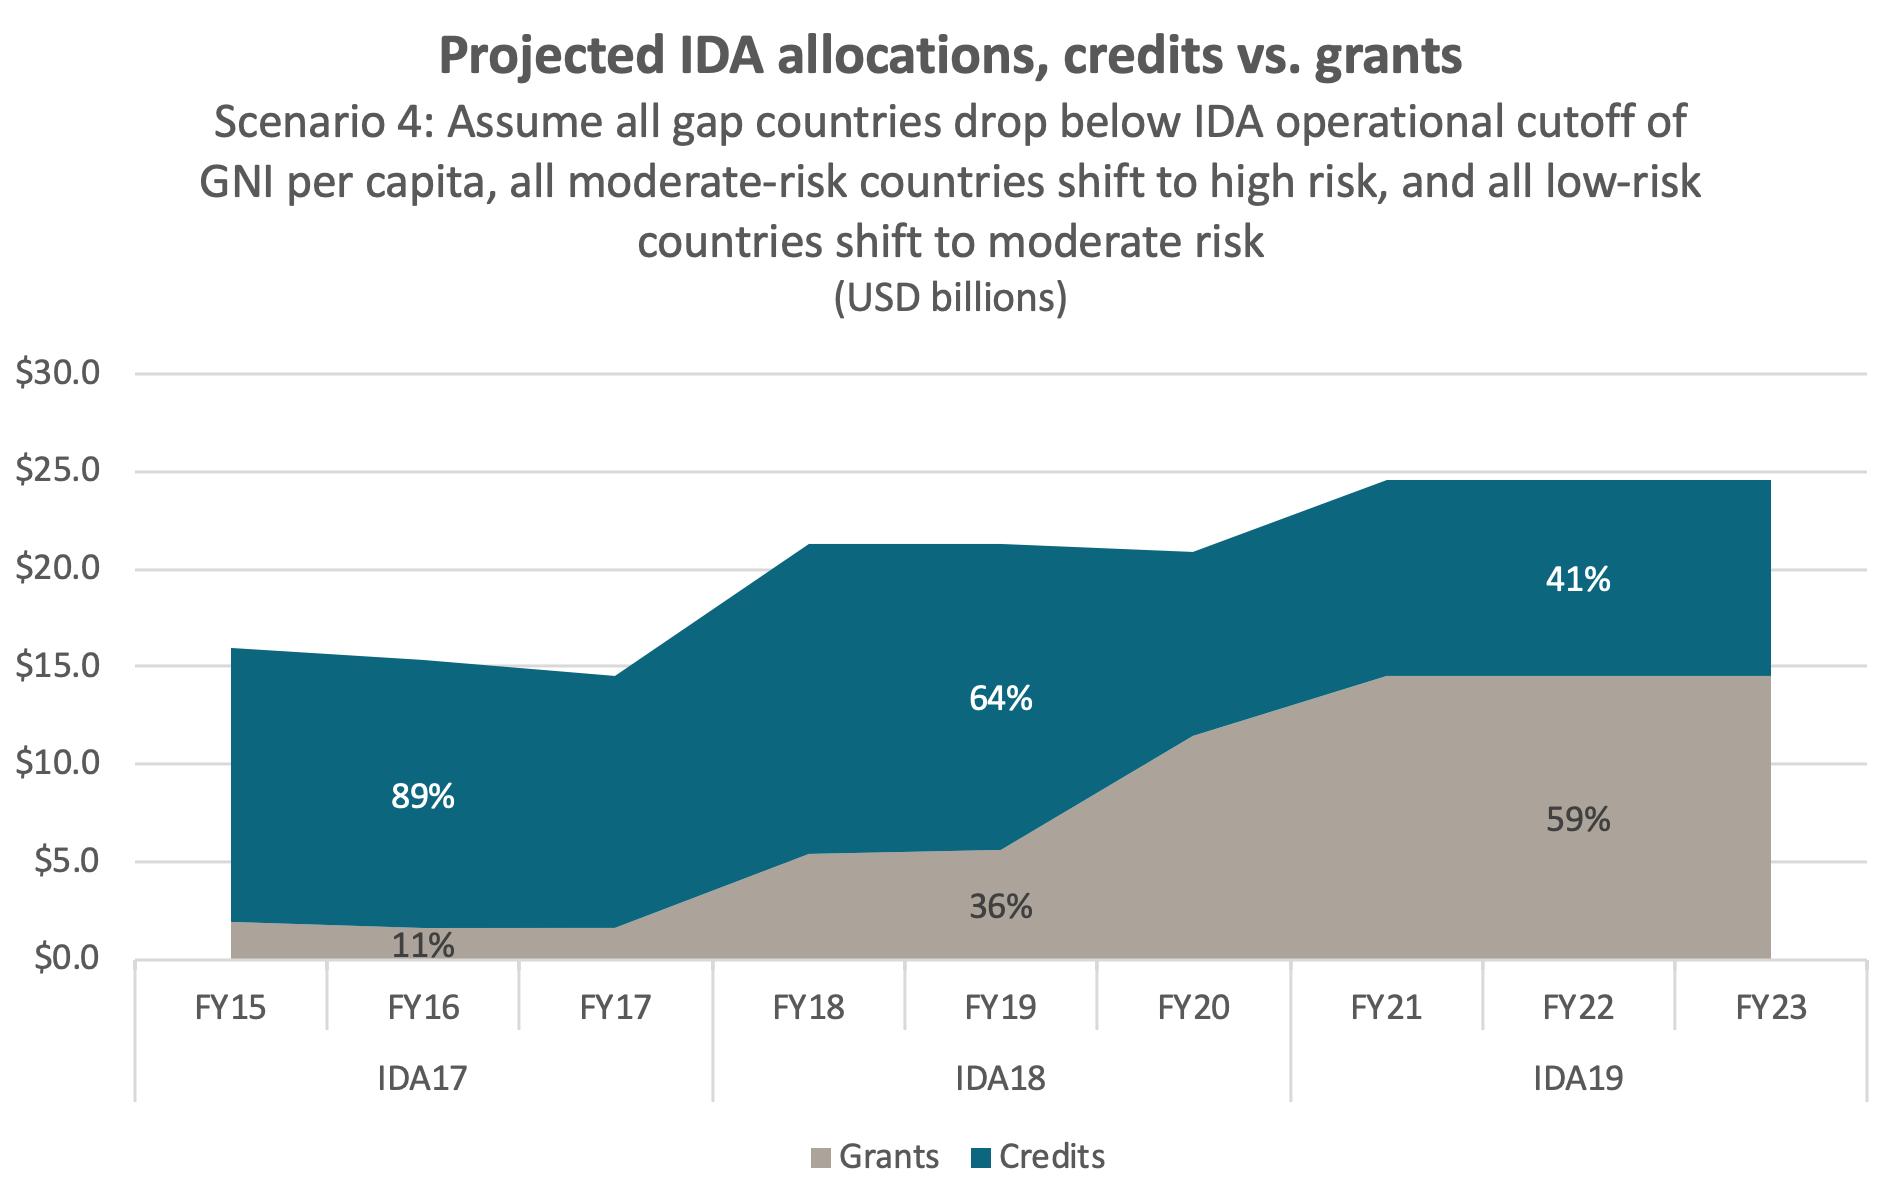 Projected IDA allocations under scenario 4, with grants rising to 59%